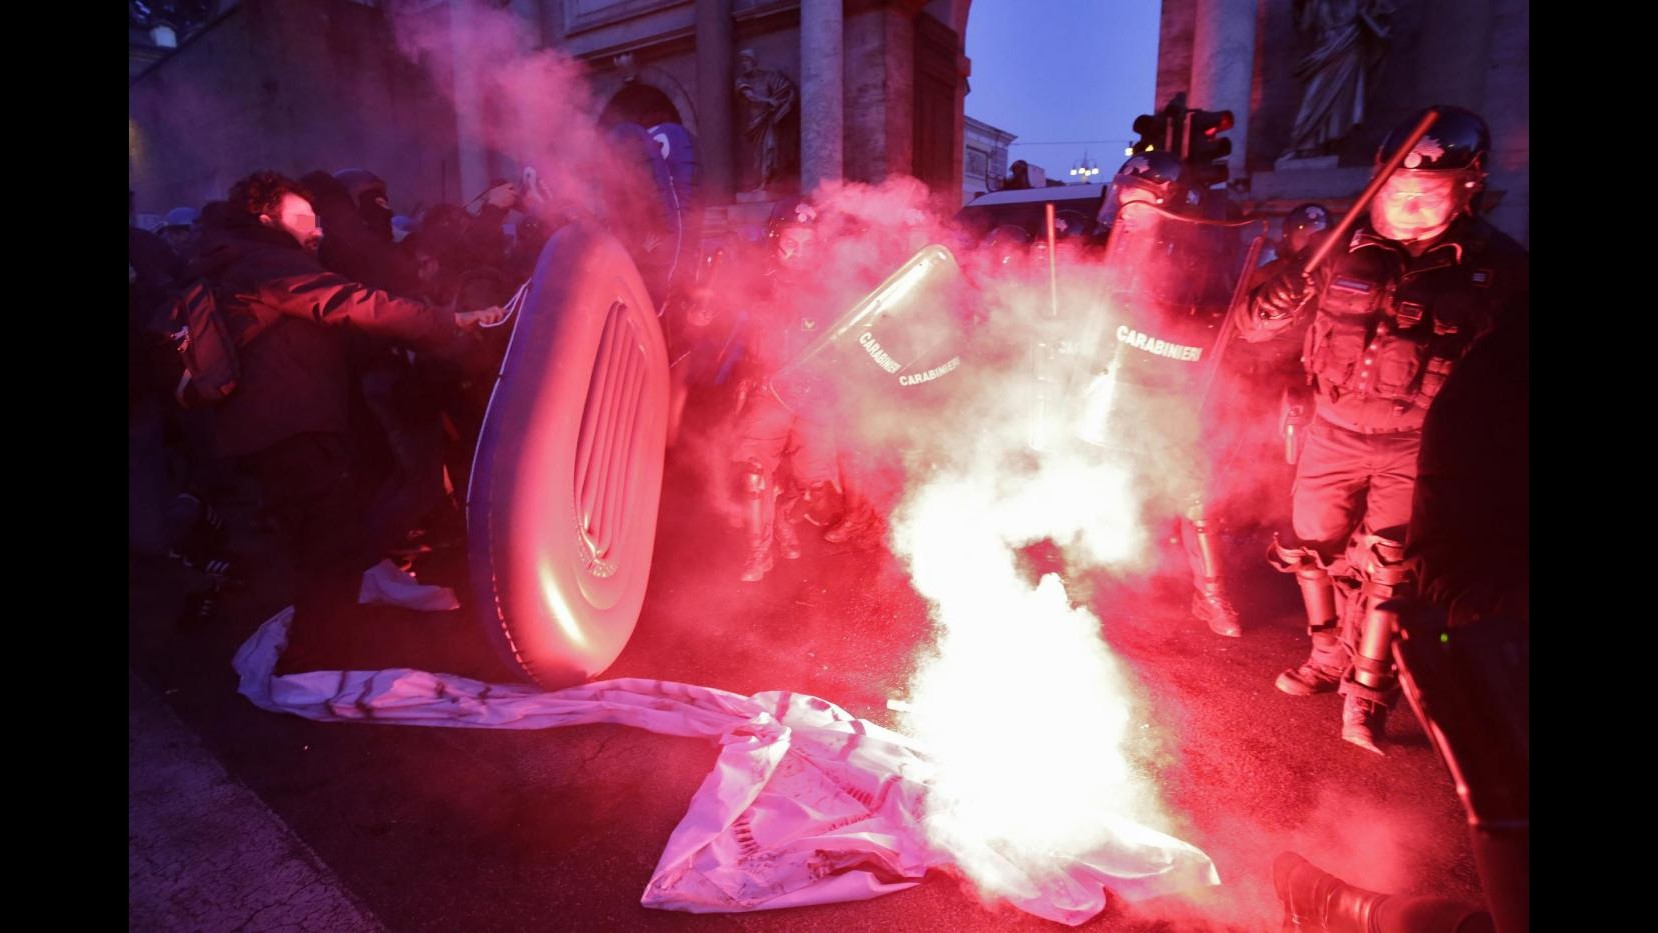 Scontri a Roma fra polizia e manifestanti anti-Salvini: 5 fermi